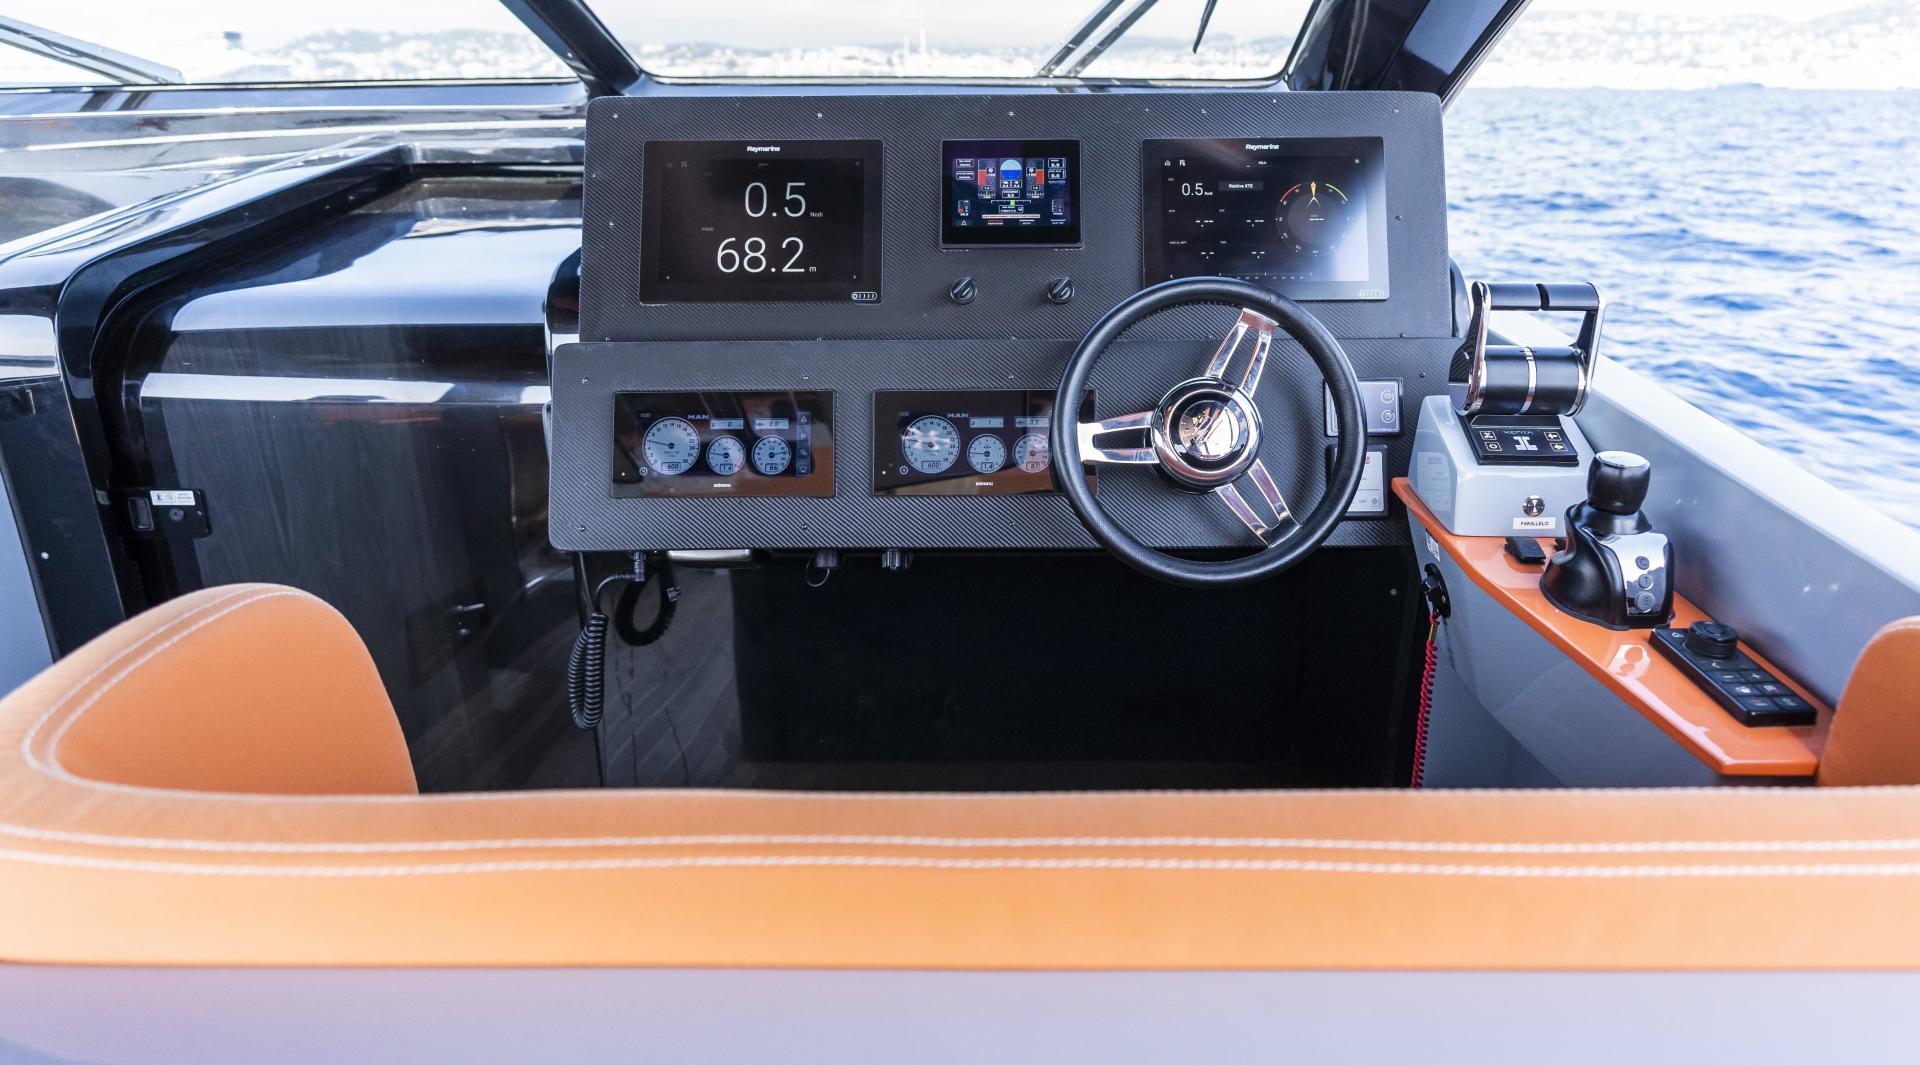 Pirelli-PZero 1900 2020-PZero 1900 Fort Lauderdale -Florida-United States-1549426 | Thumbnail